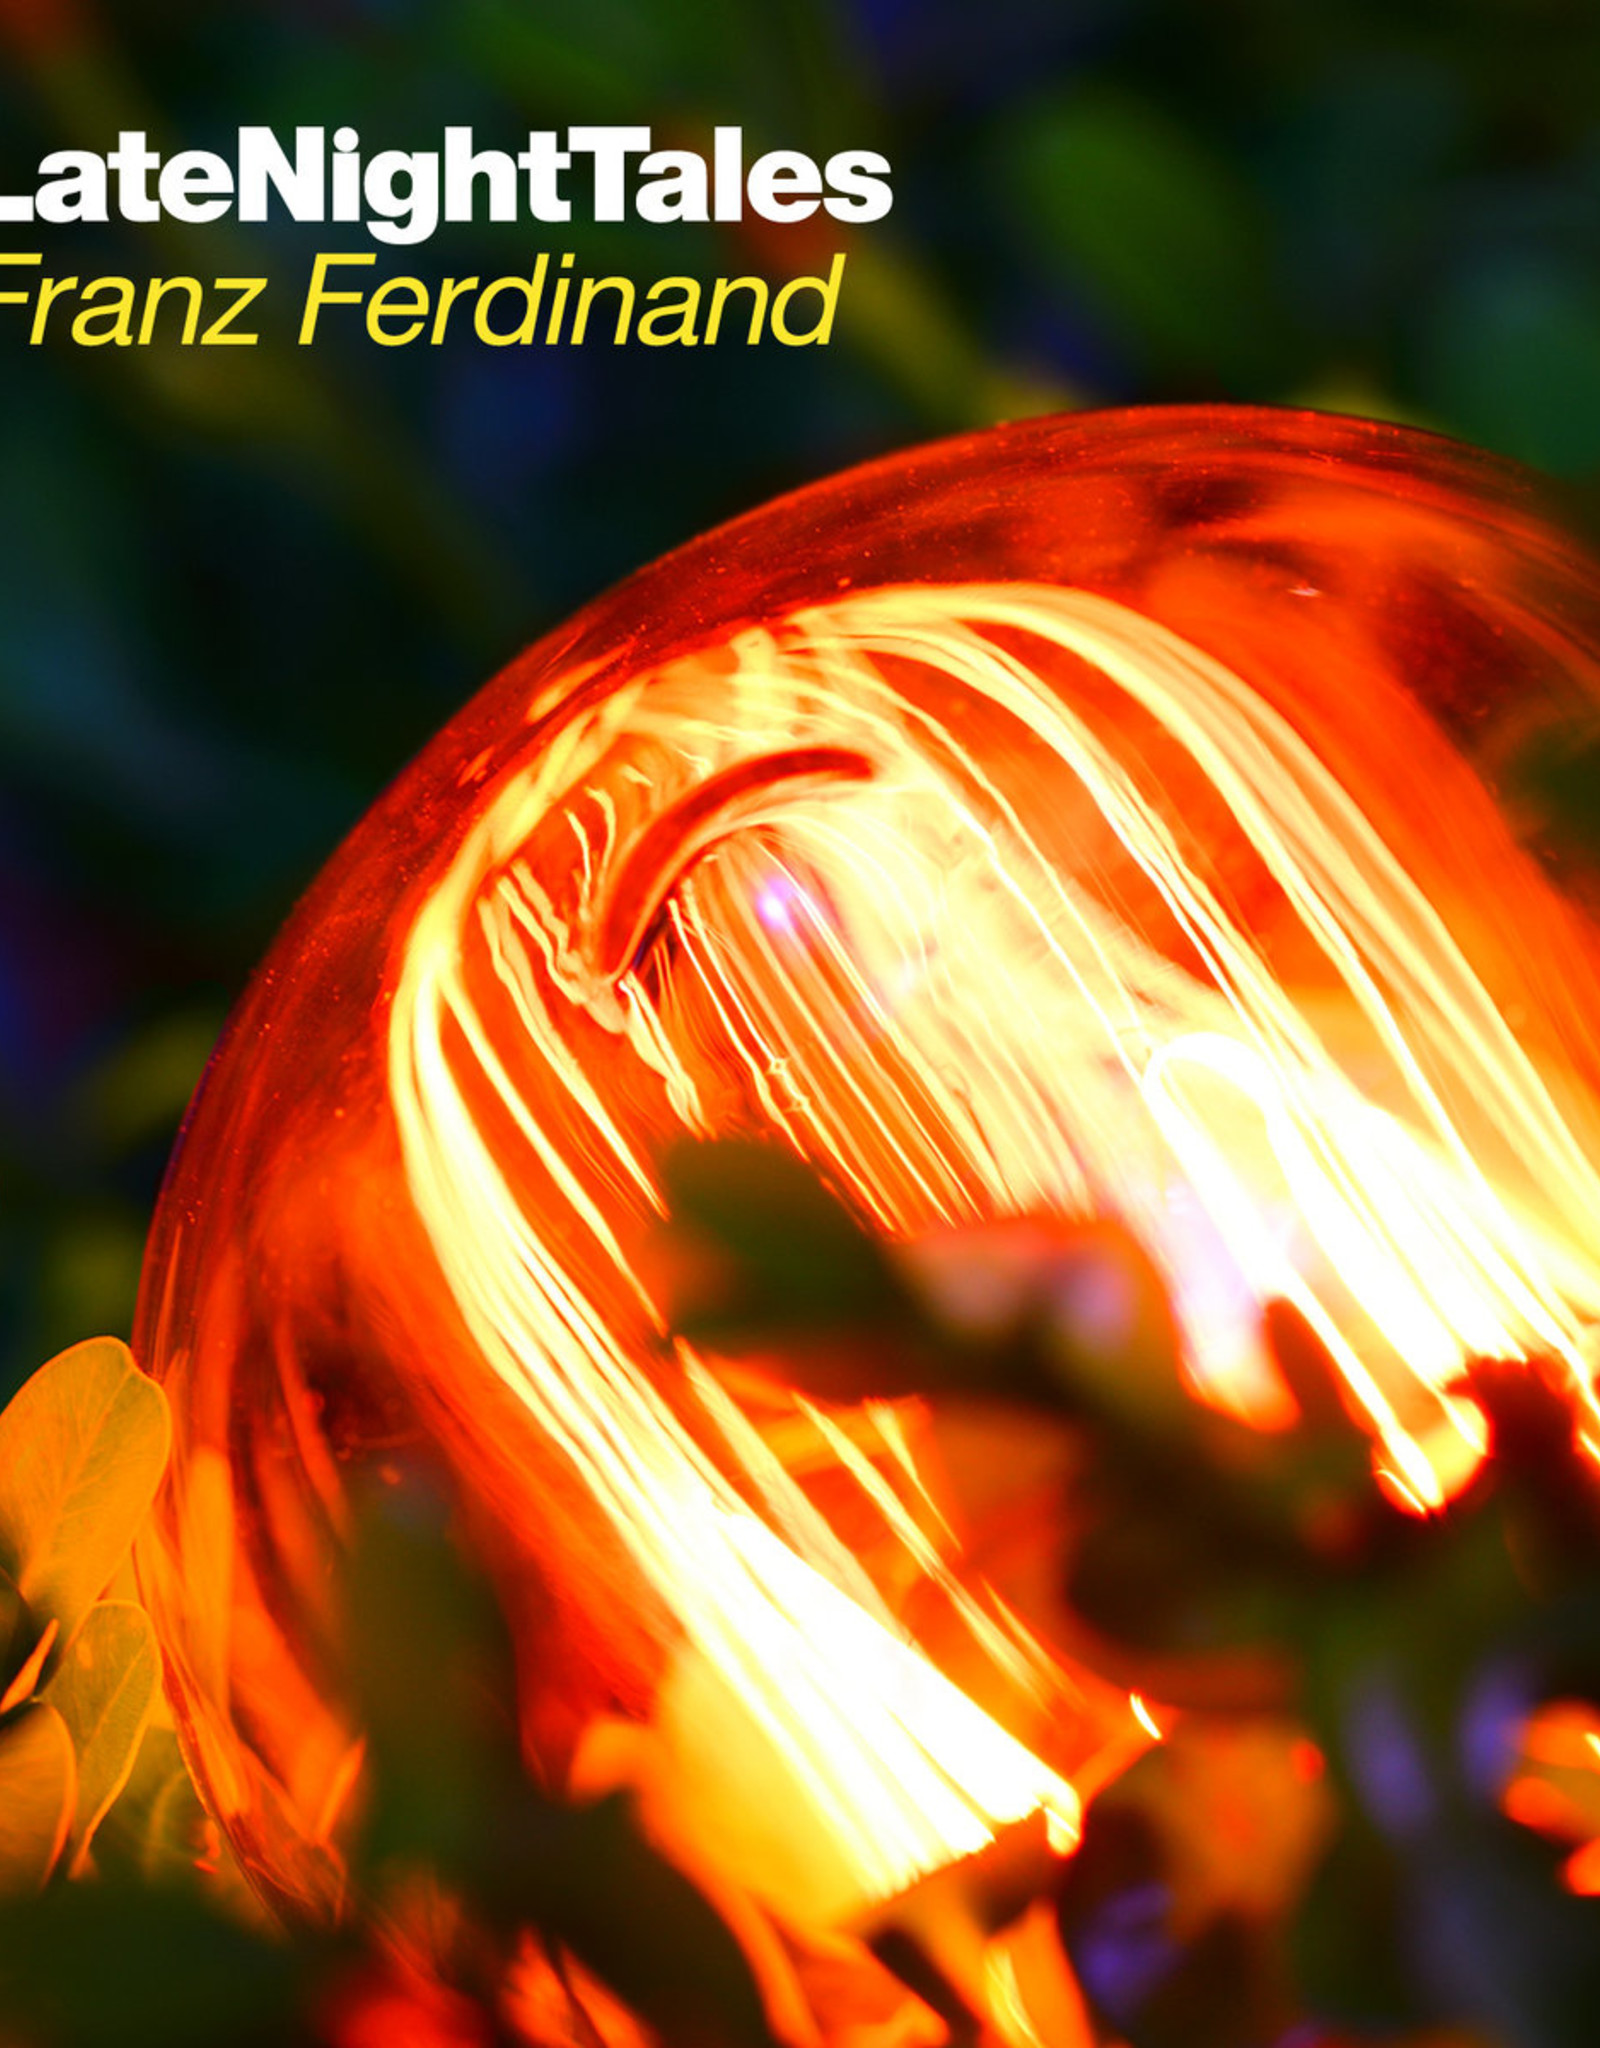 Late Night Tales: Franz Ferdinand - Late Night Tales: Franz Ferdinand